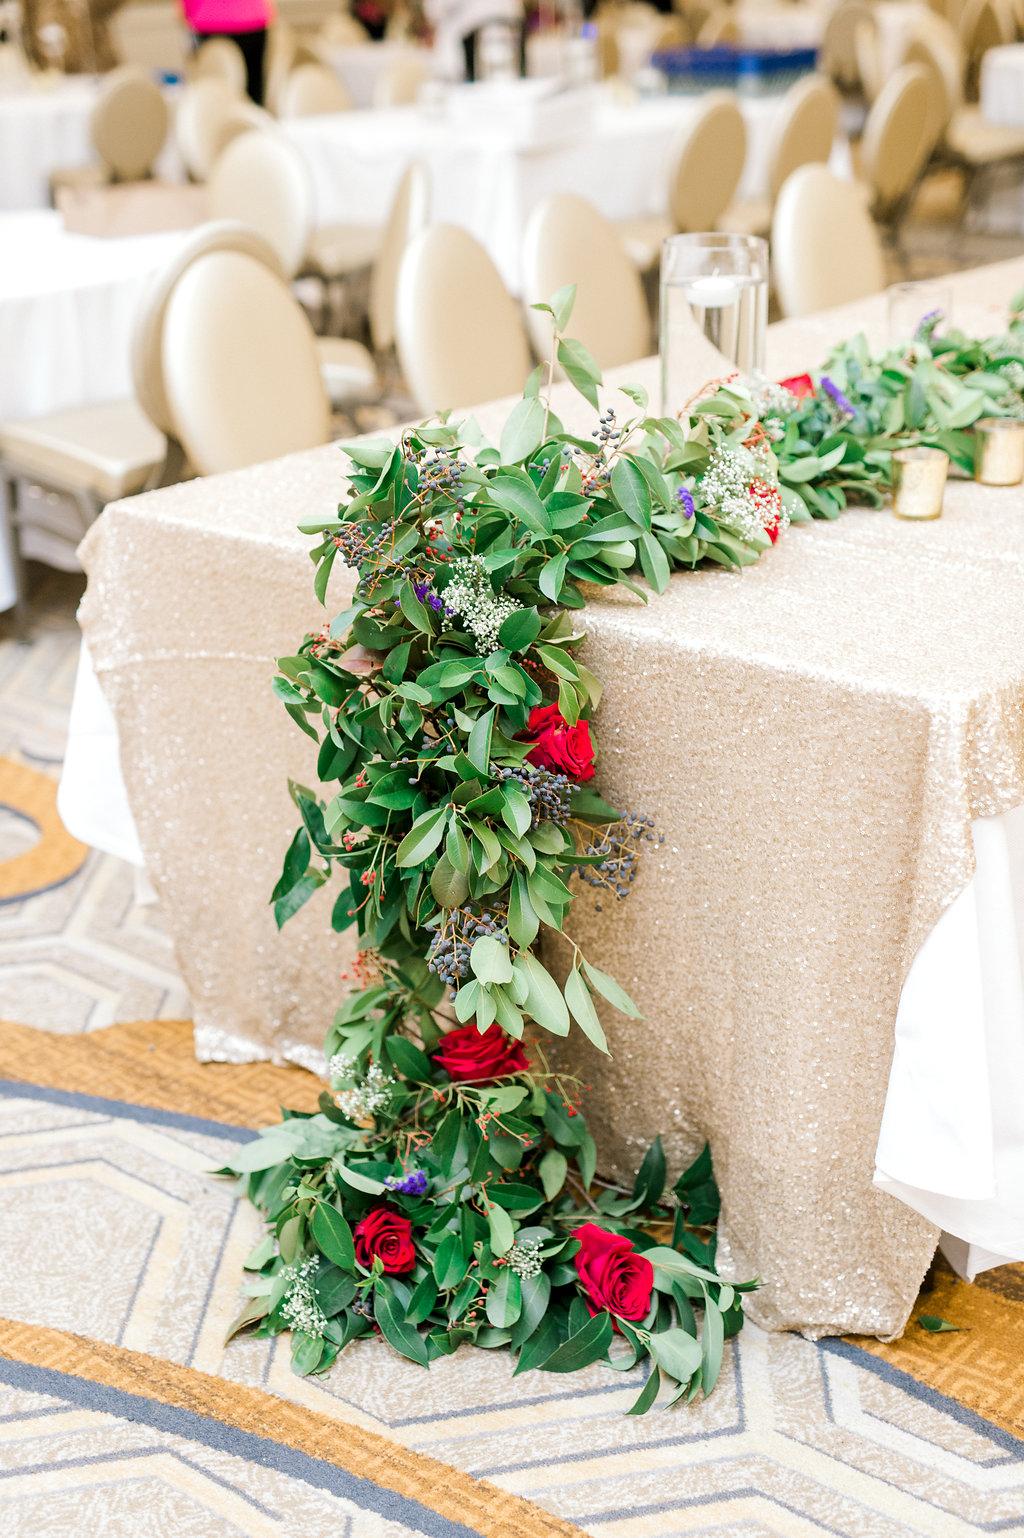 Wedding decor costs add up